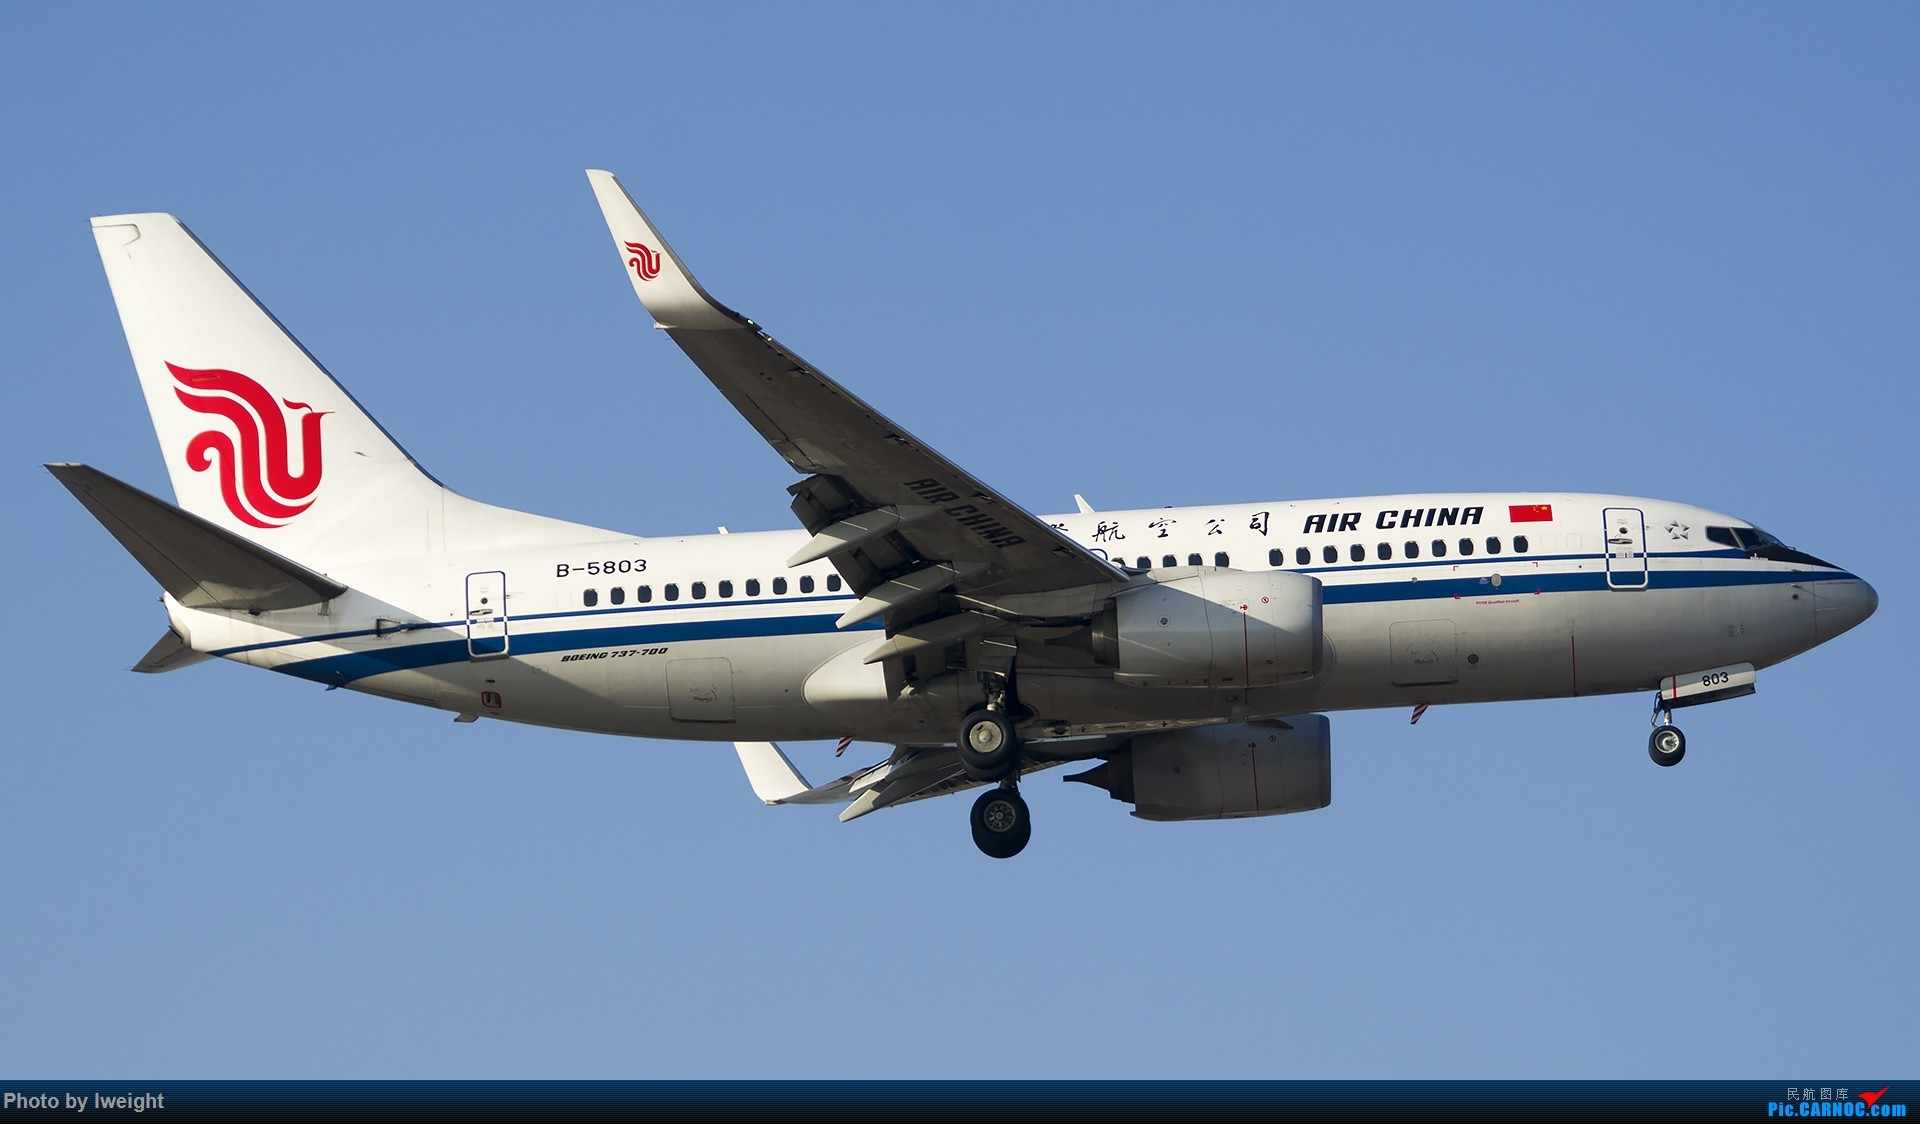 Re:[原创]庆祝升级777,发上今天在首都机场拍的所有飞机【2014-12-14】 BOEING 737-700 B-5803 中国北京首都国际机场